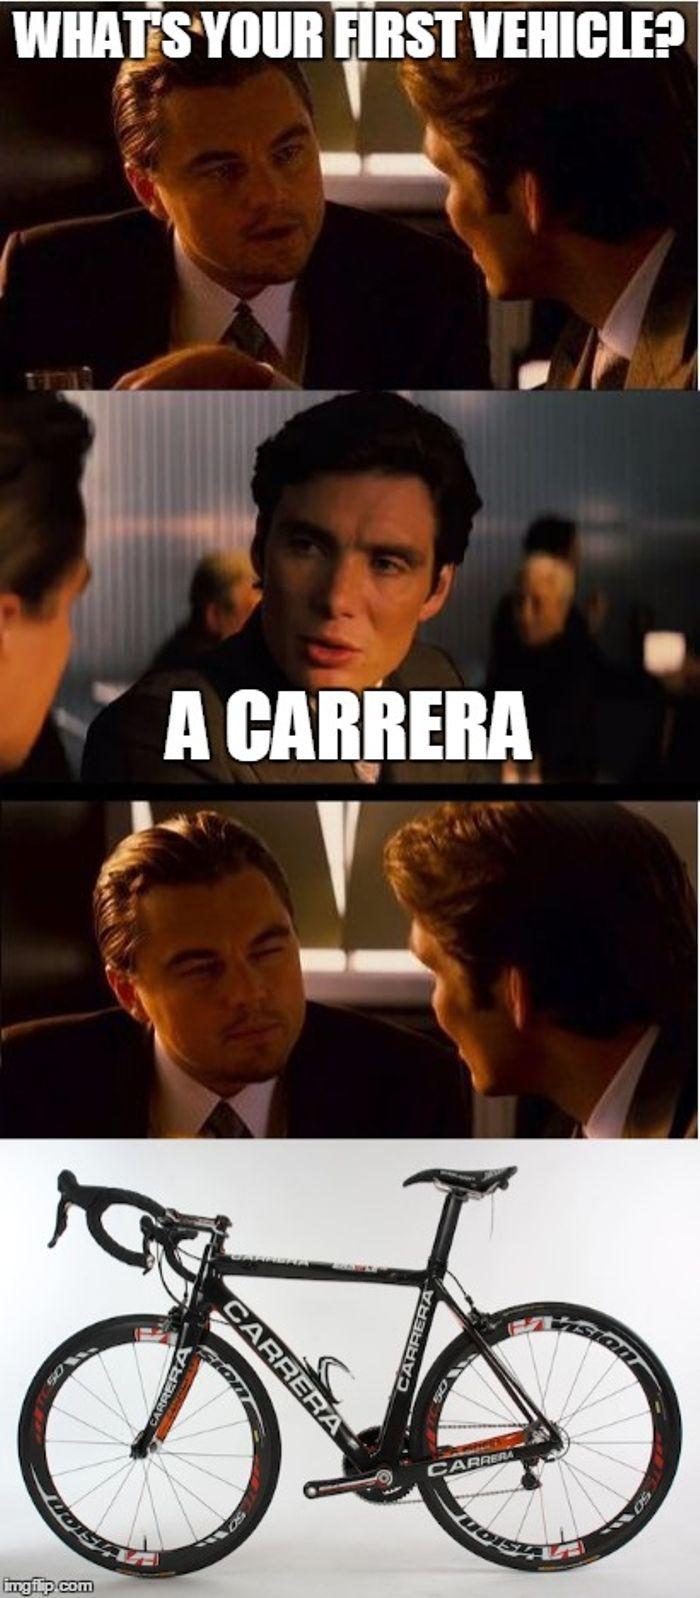 If only it was the Porsche    My friend has a Carrera bike